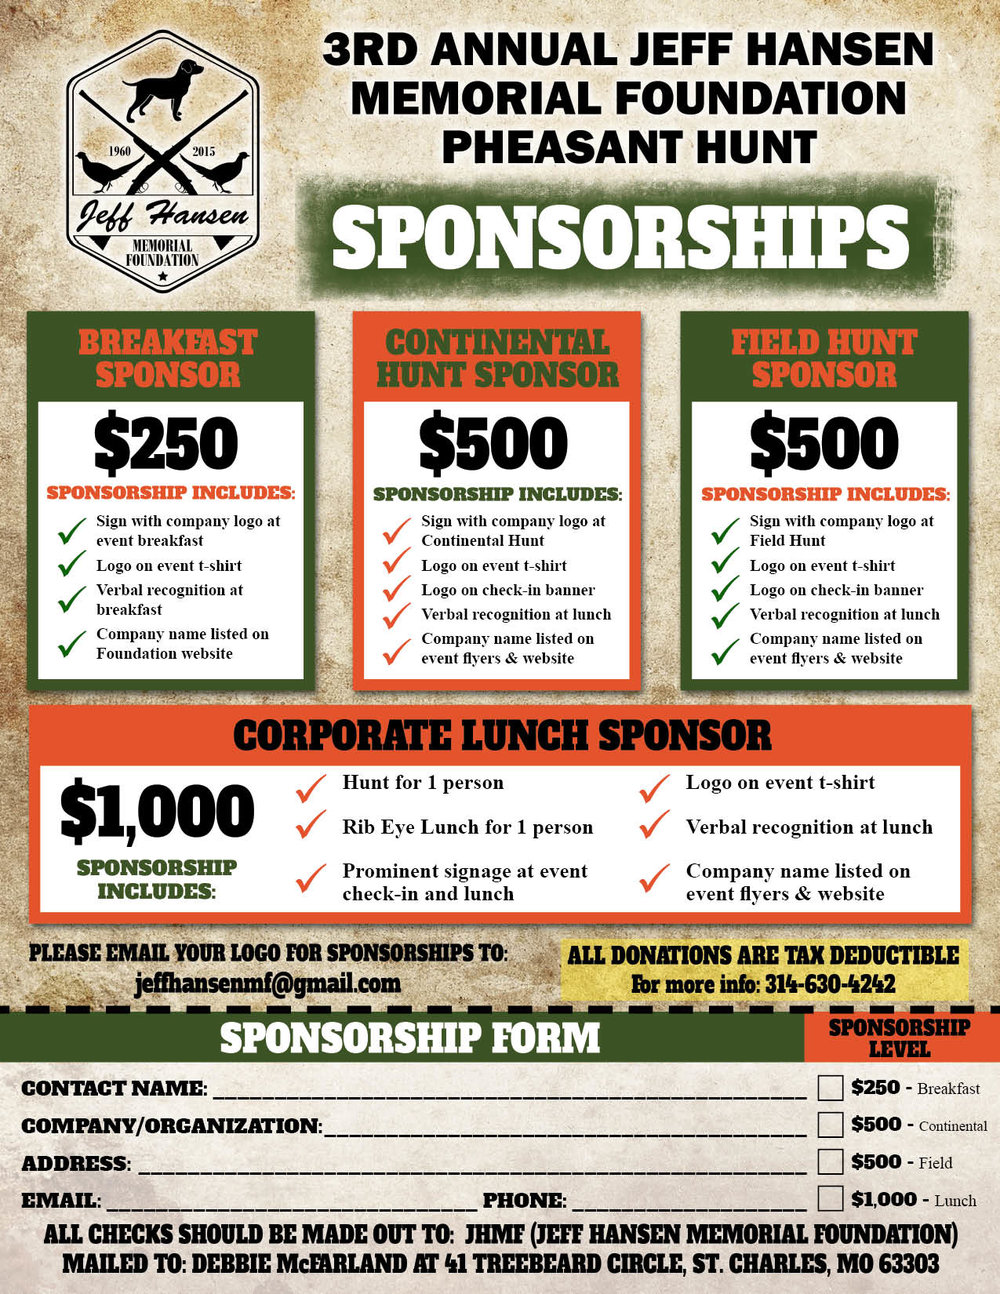 JHMF Annual Pheasant Hunt - 20182.jpg